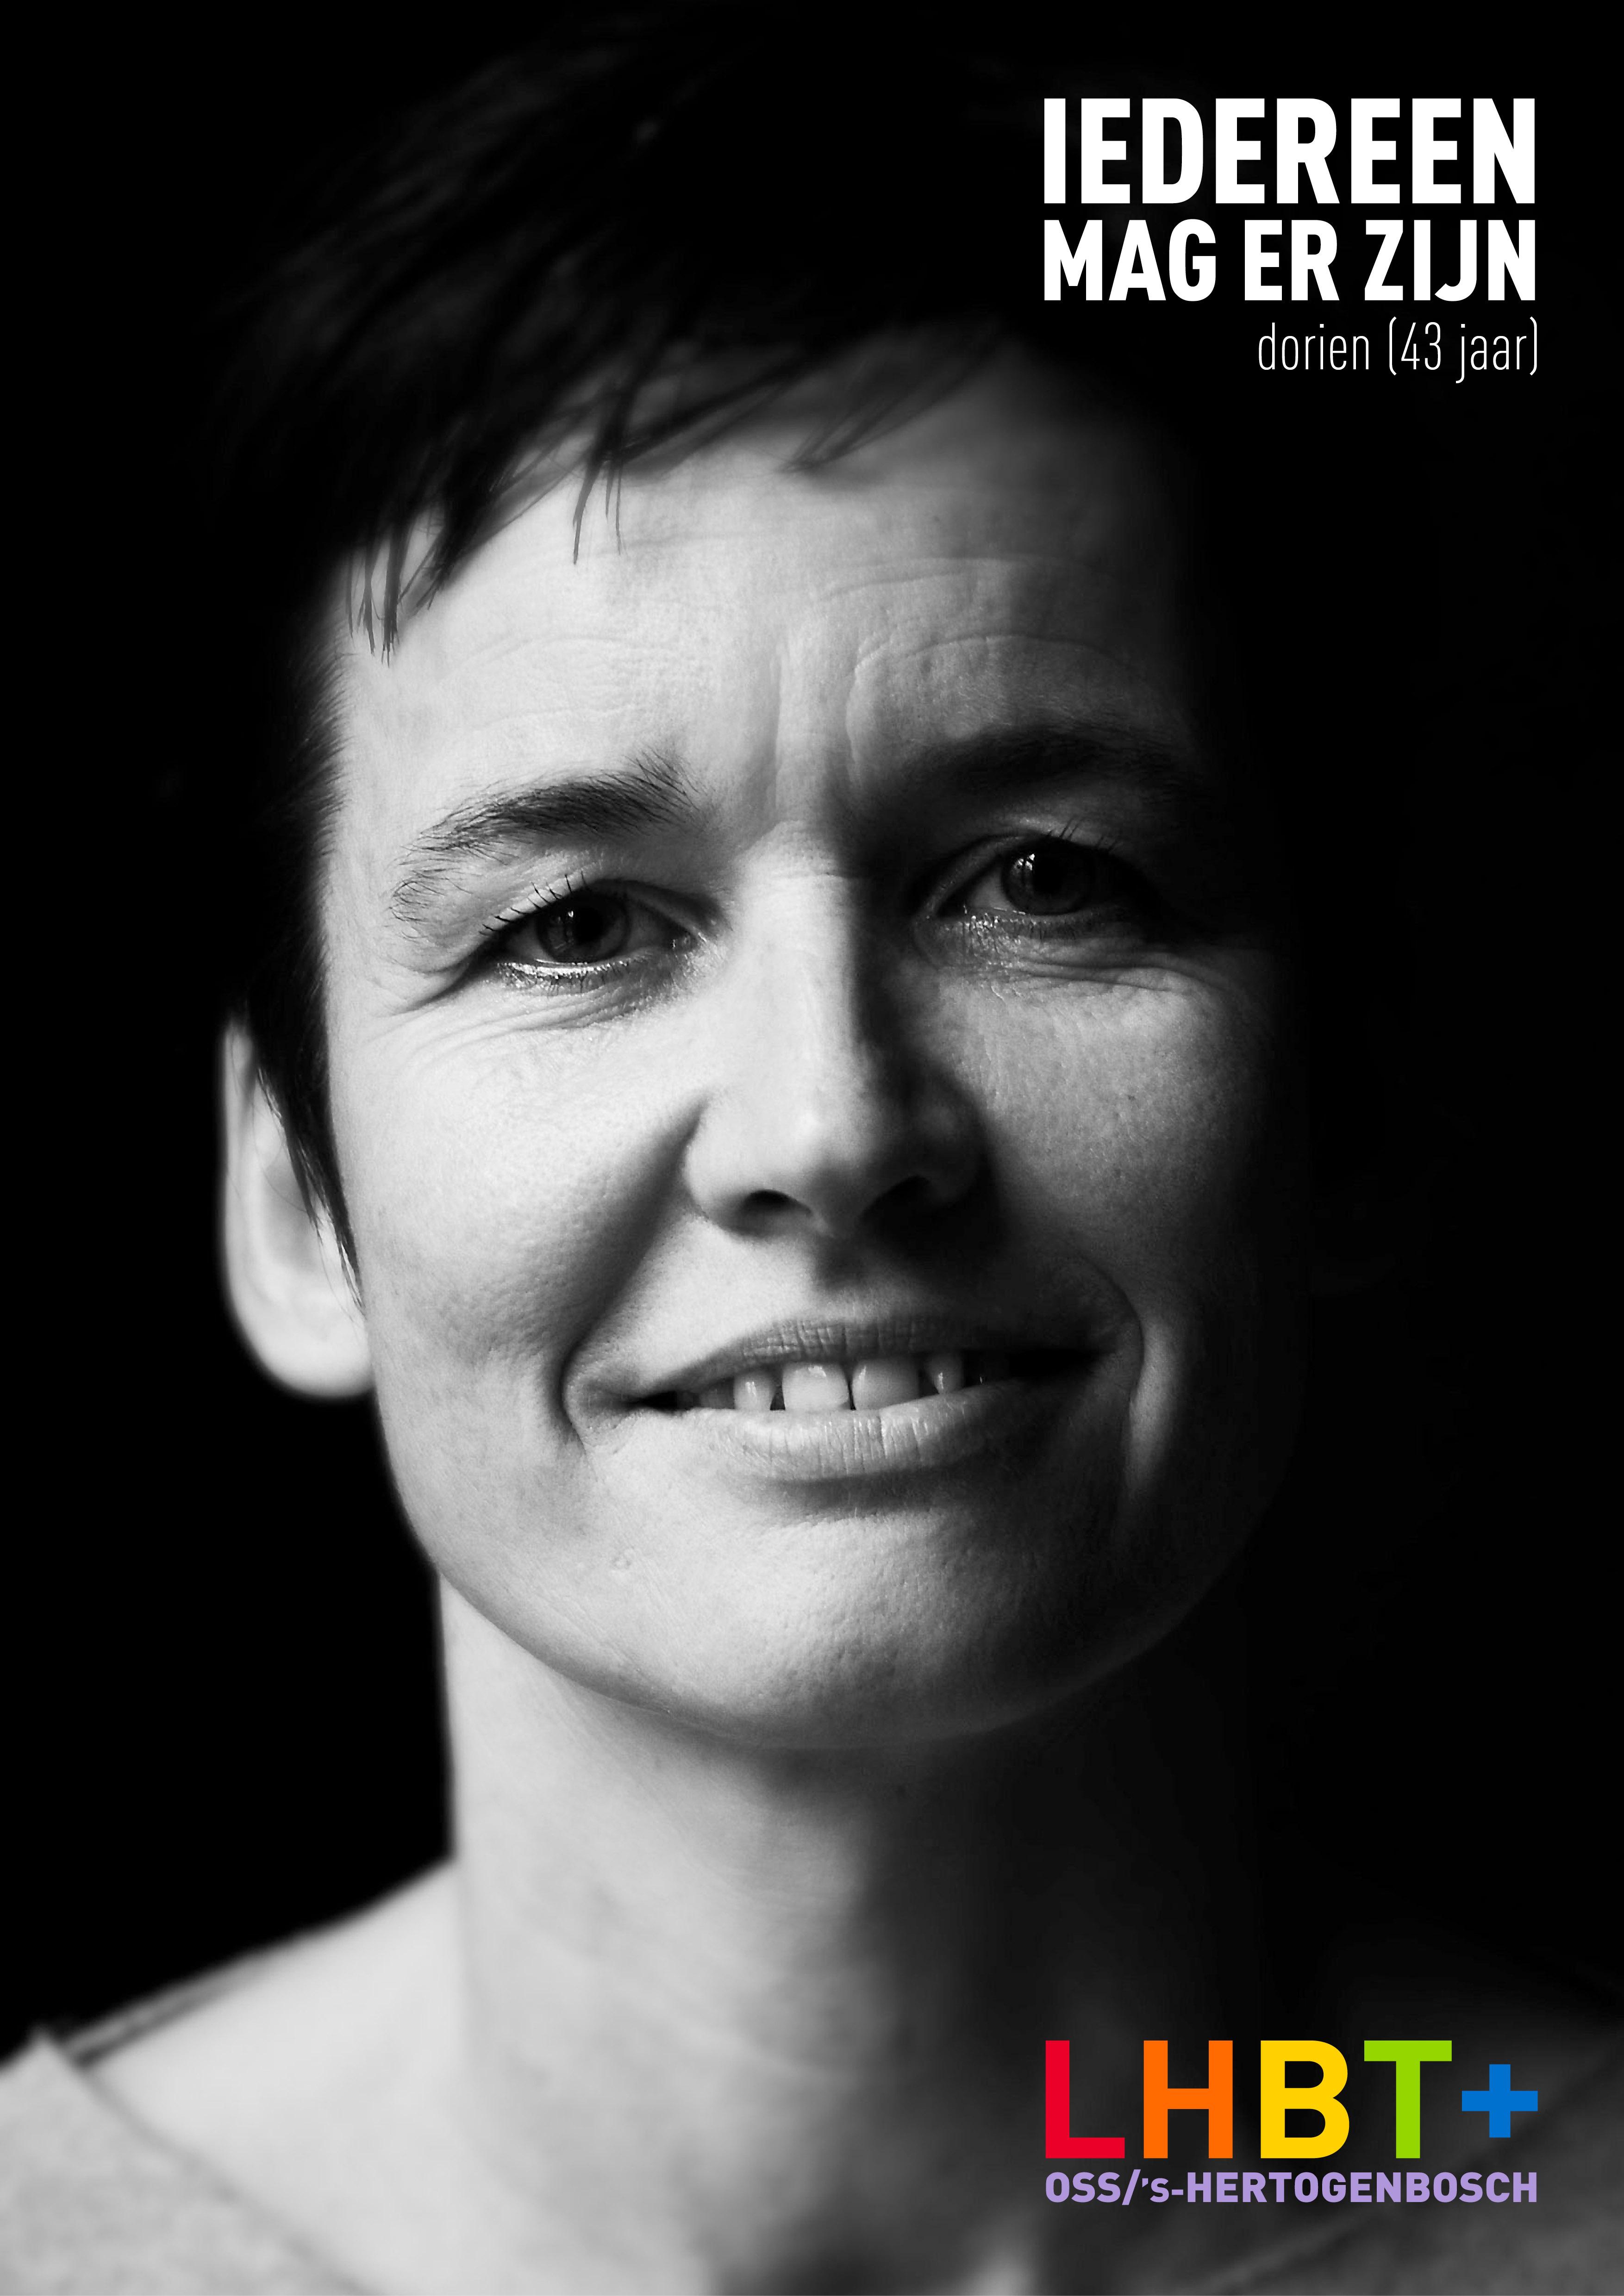 Dorien Stegeman [43] | docente lichamelijke opvoeding | holistisch massagetherapeut | 's-Hertogenbosch